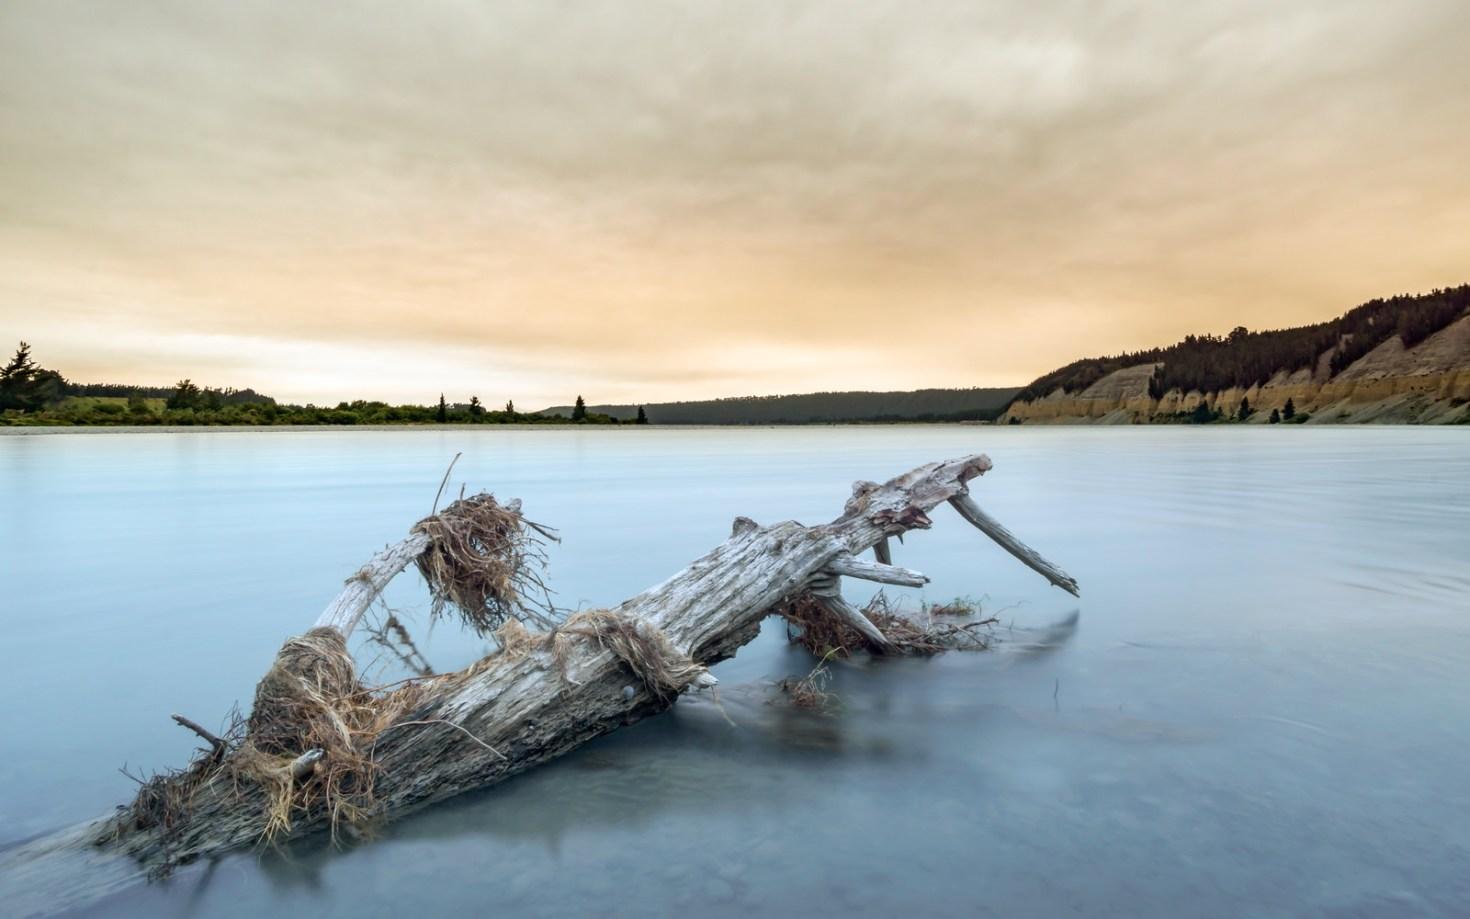 New Zealand, Mount Hutt - Sunset Rakaia River